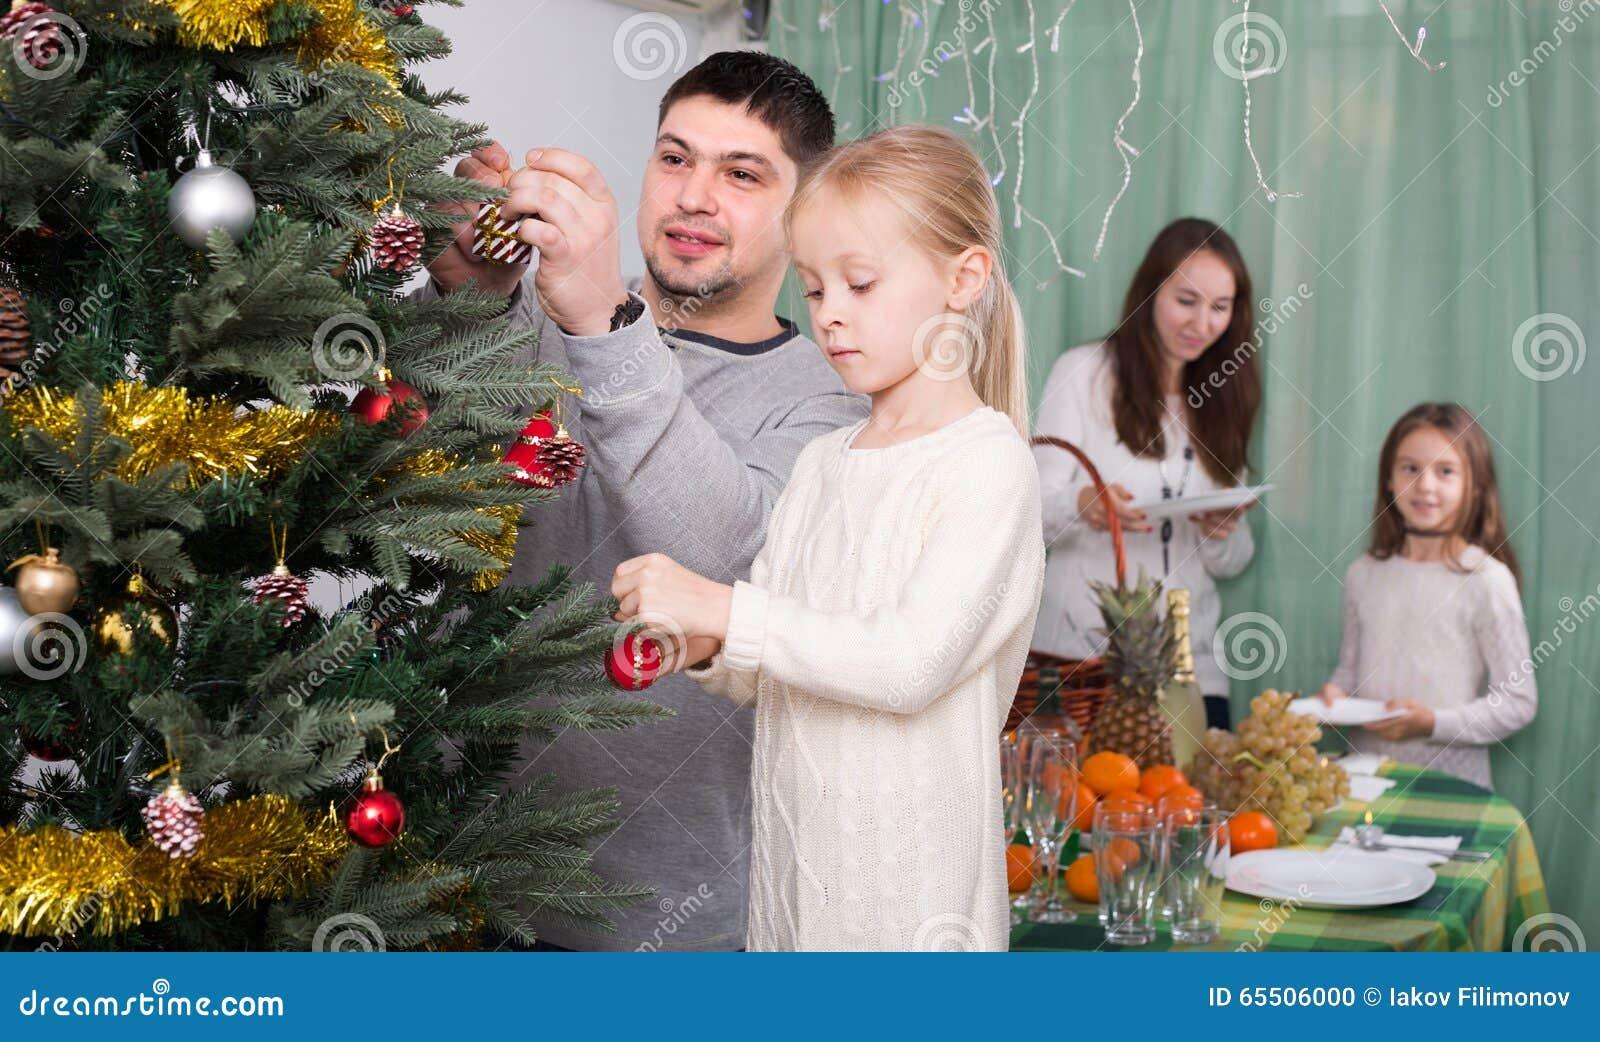 Family Decorating Christmas Tree At Home Stock Photo